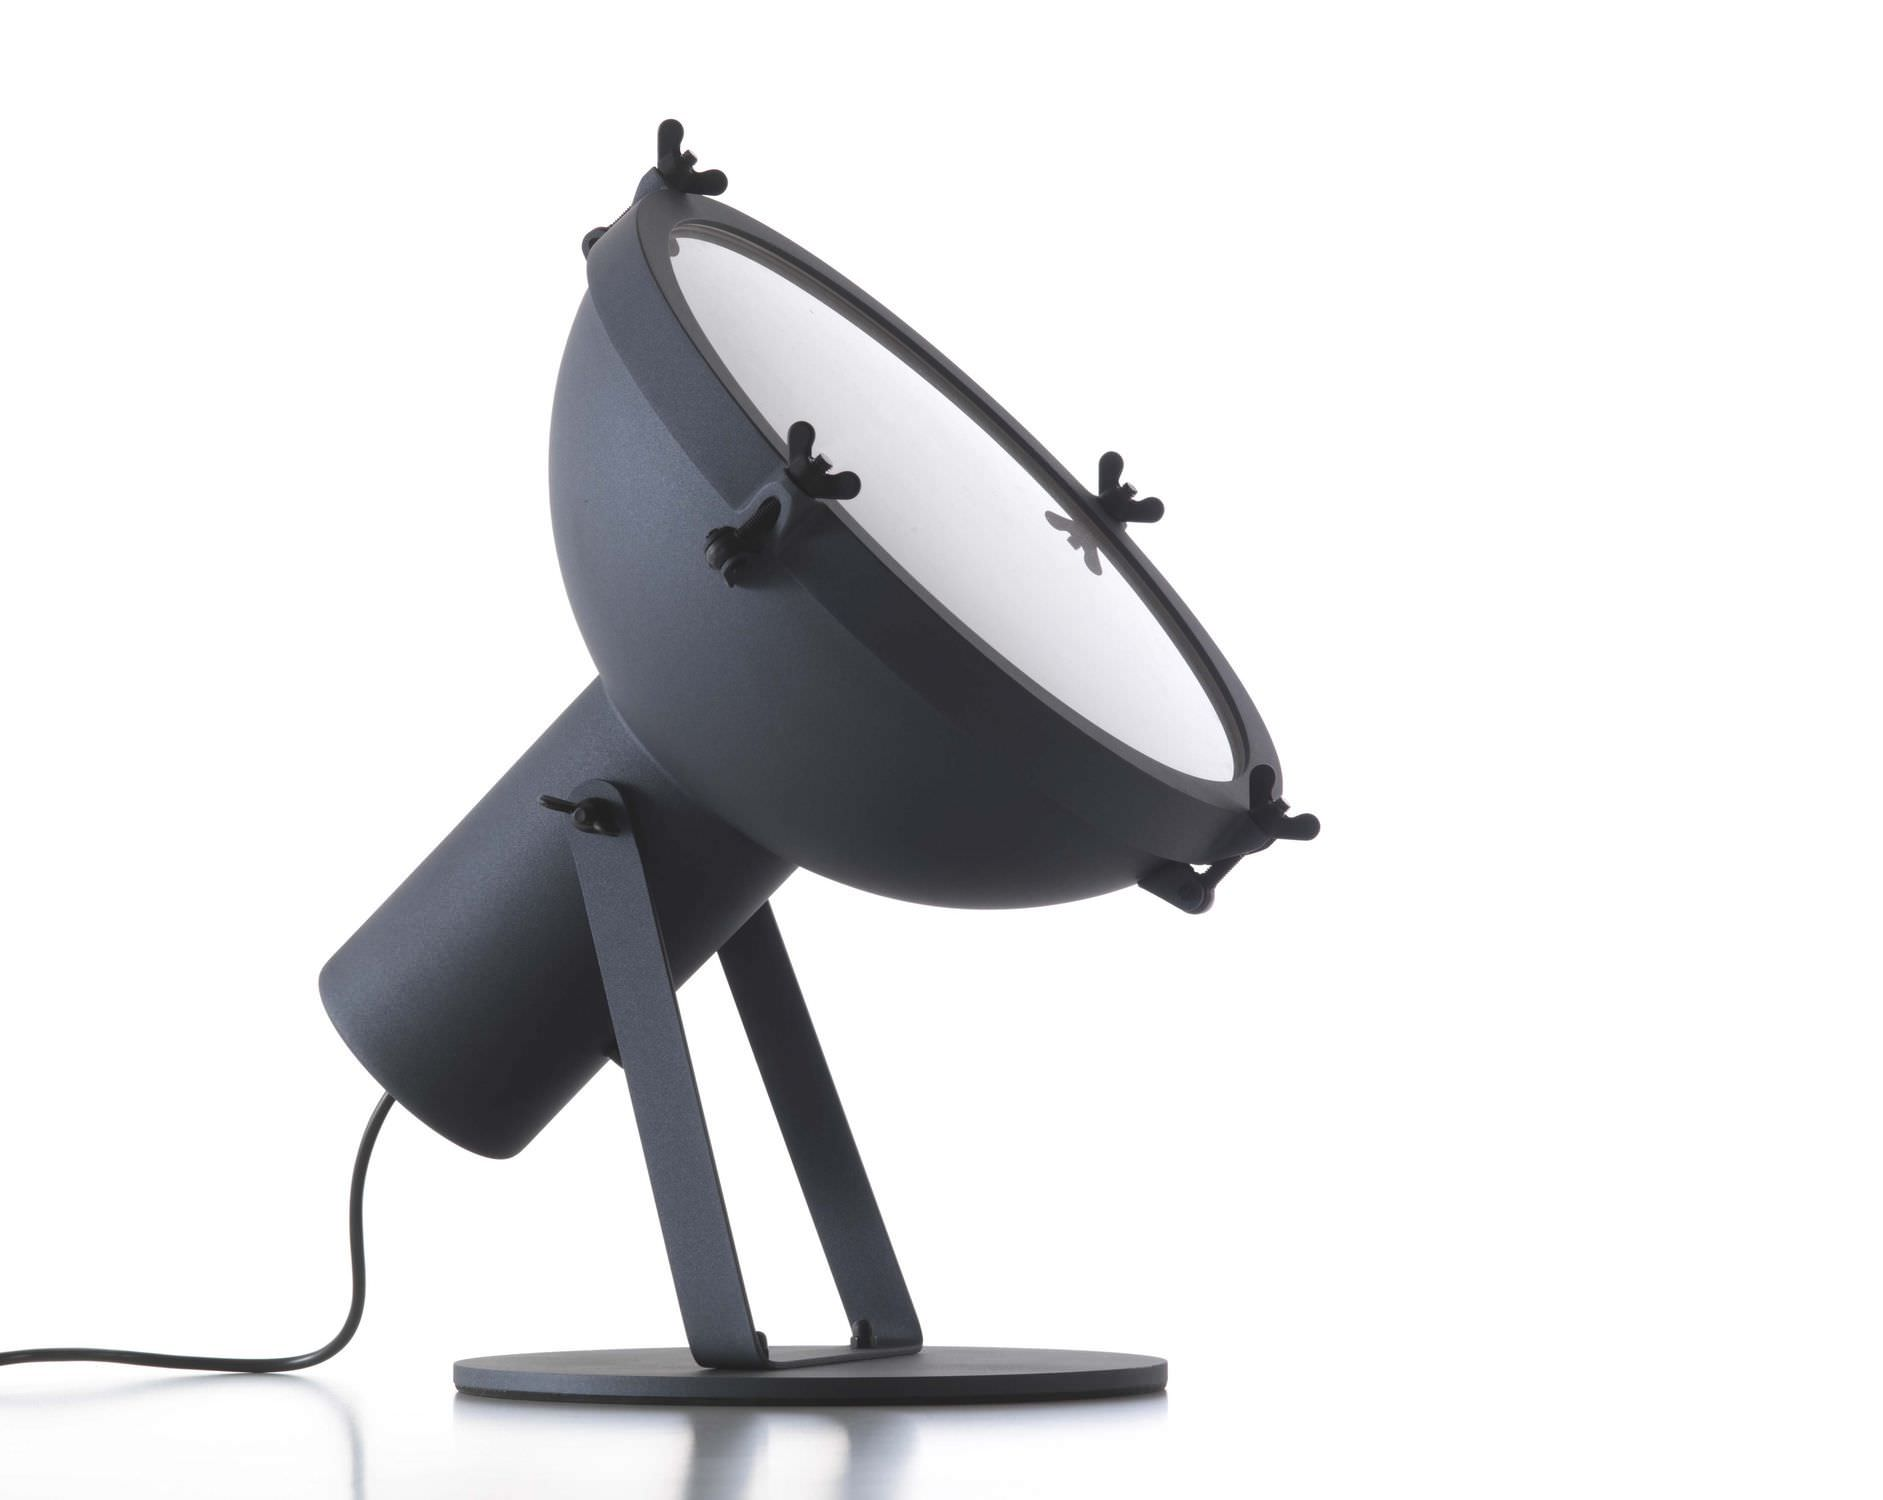 Floor lamp / original design / aluminum / glass - PROJECTEUR 365 by ...